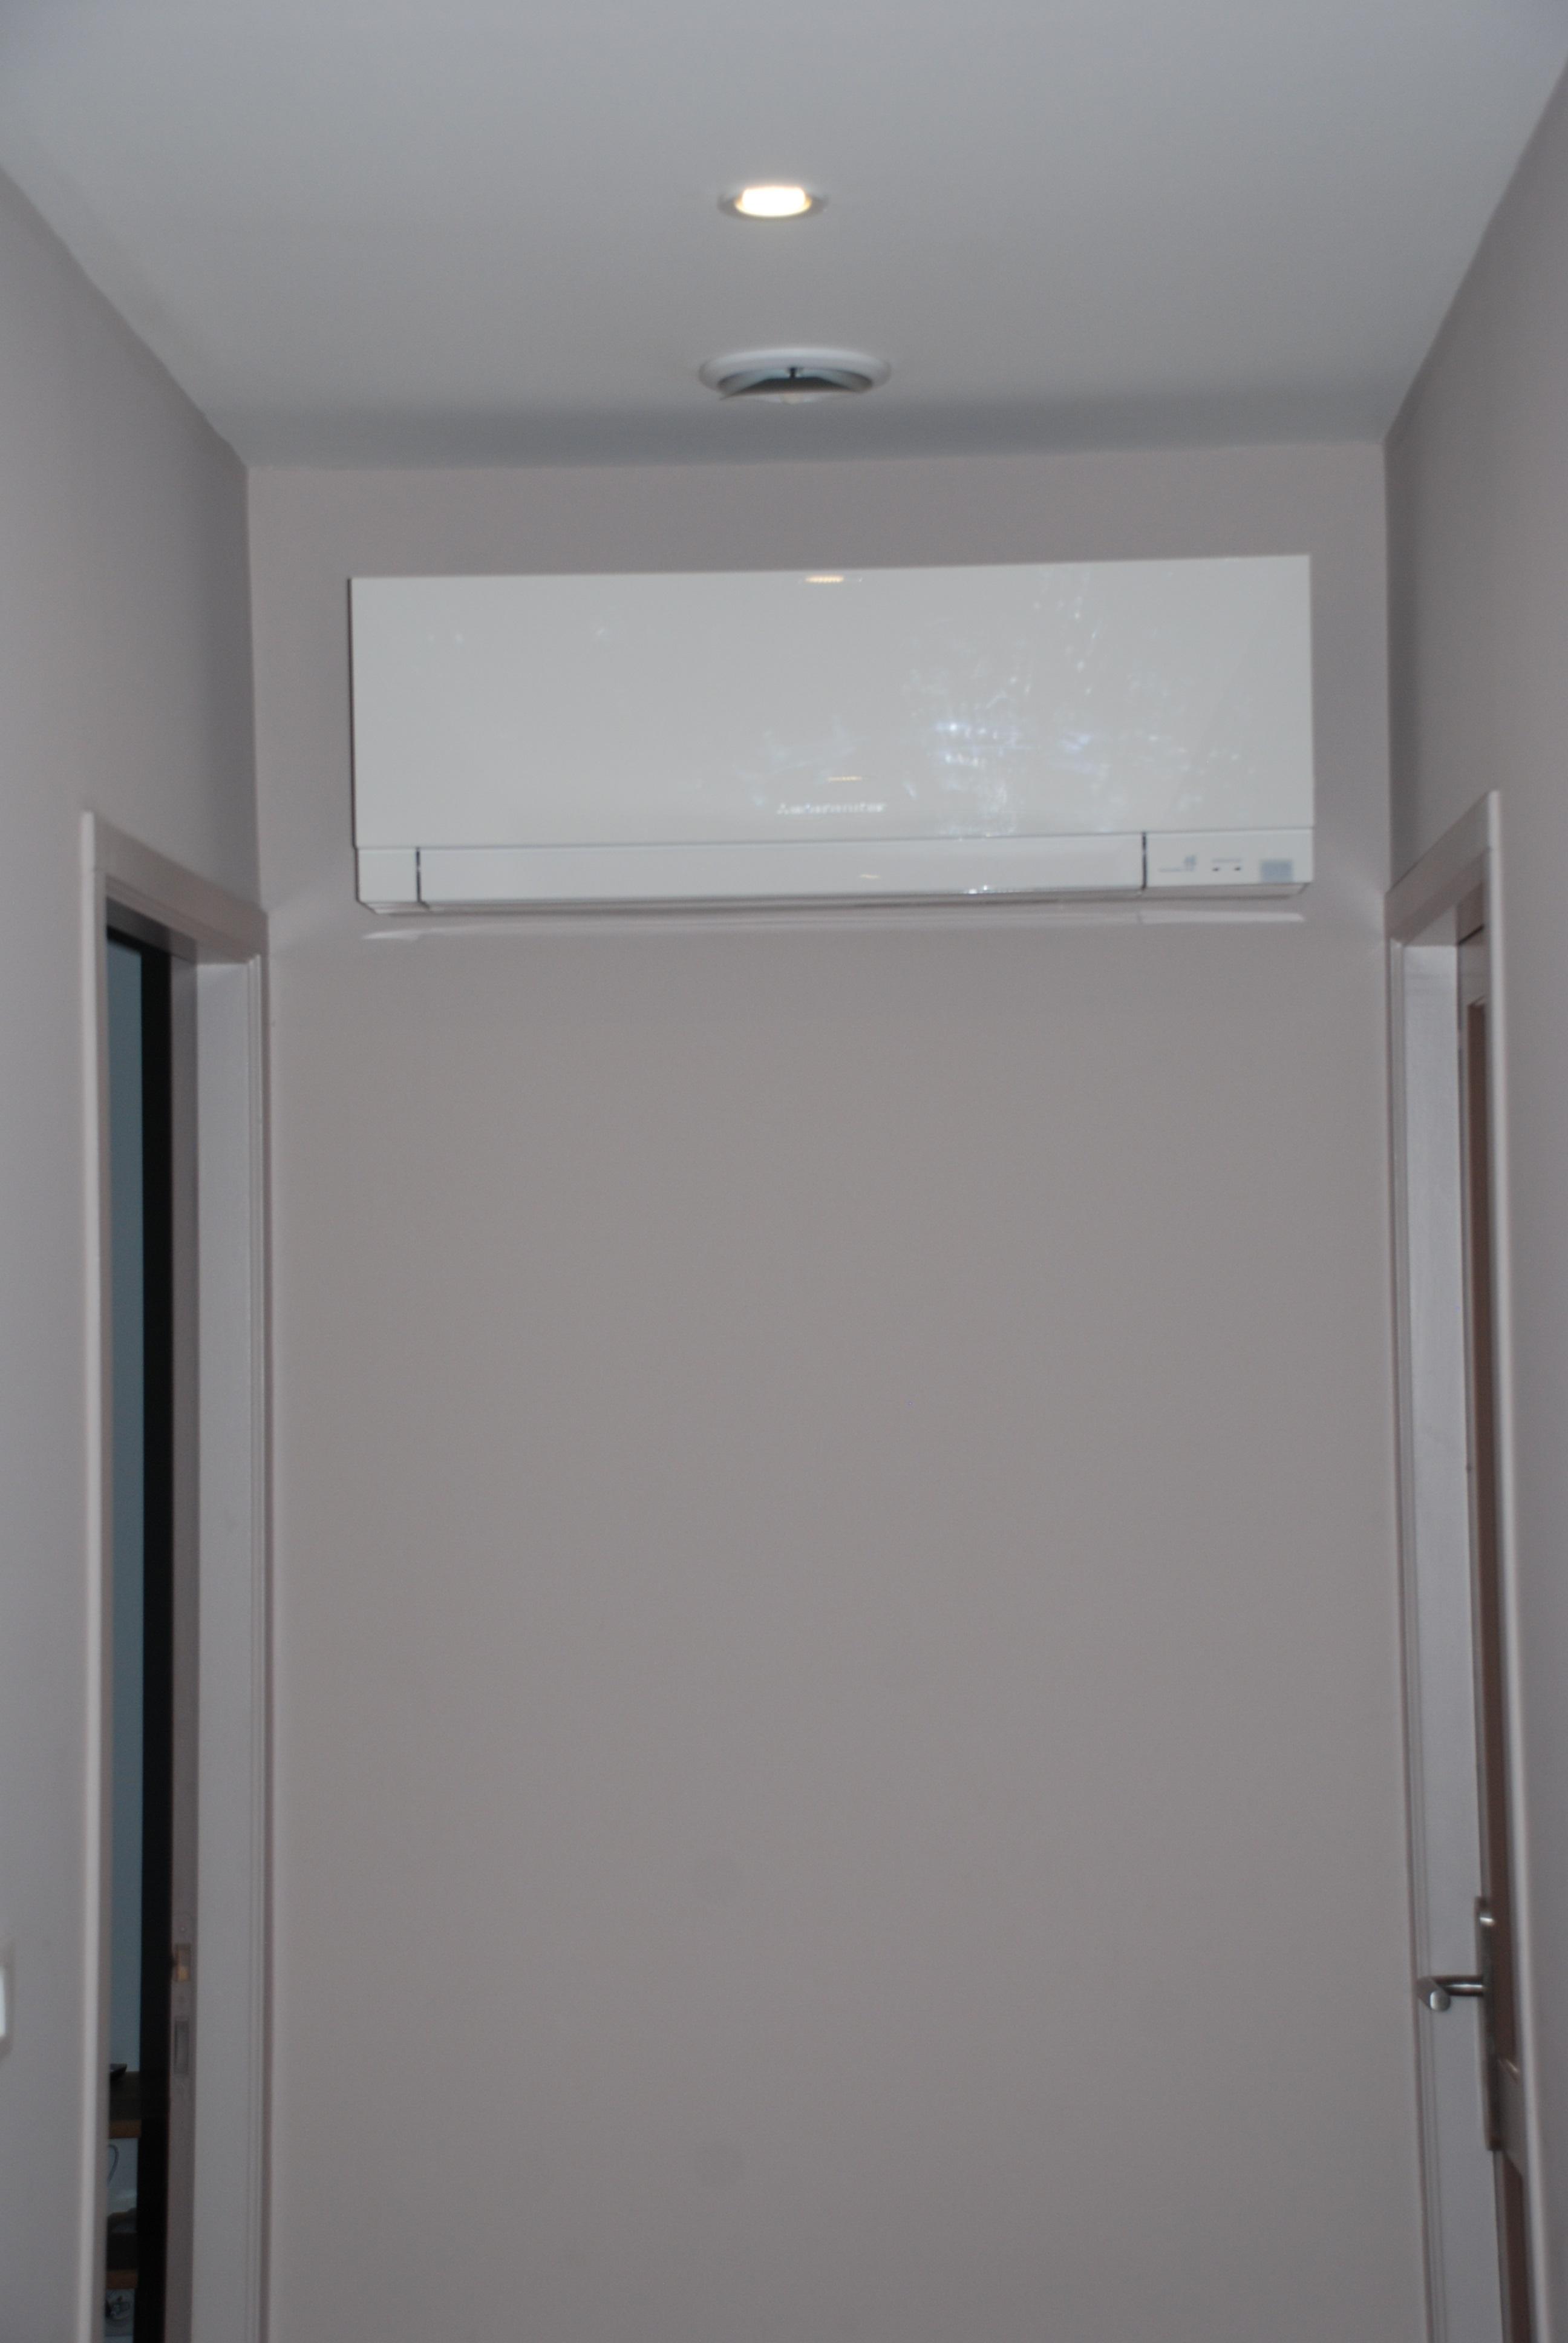 Installer Une Clim Réversible dedans installation de climatisation ~~ travaux renovation climatisation